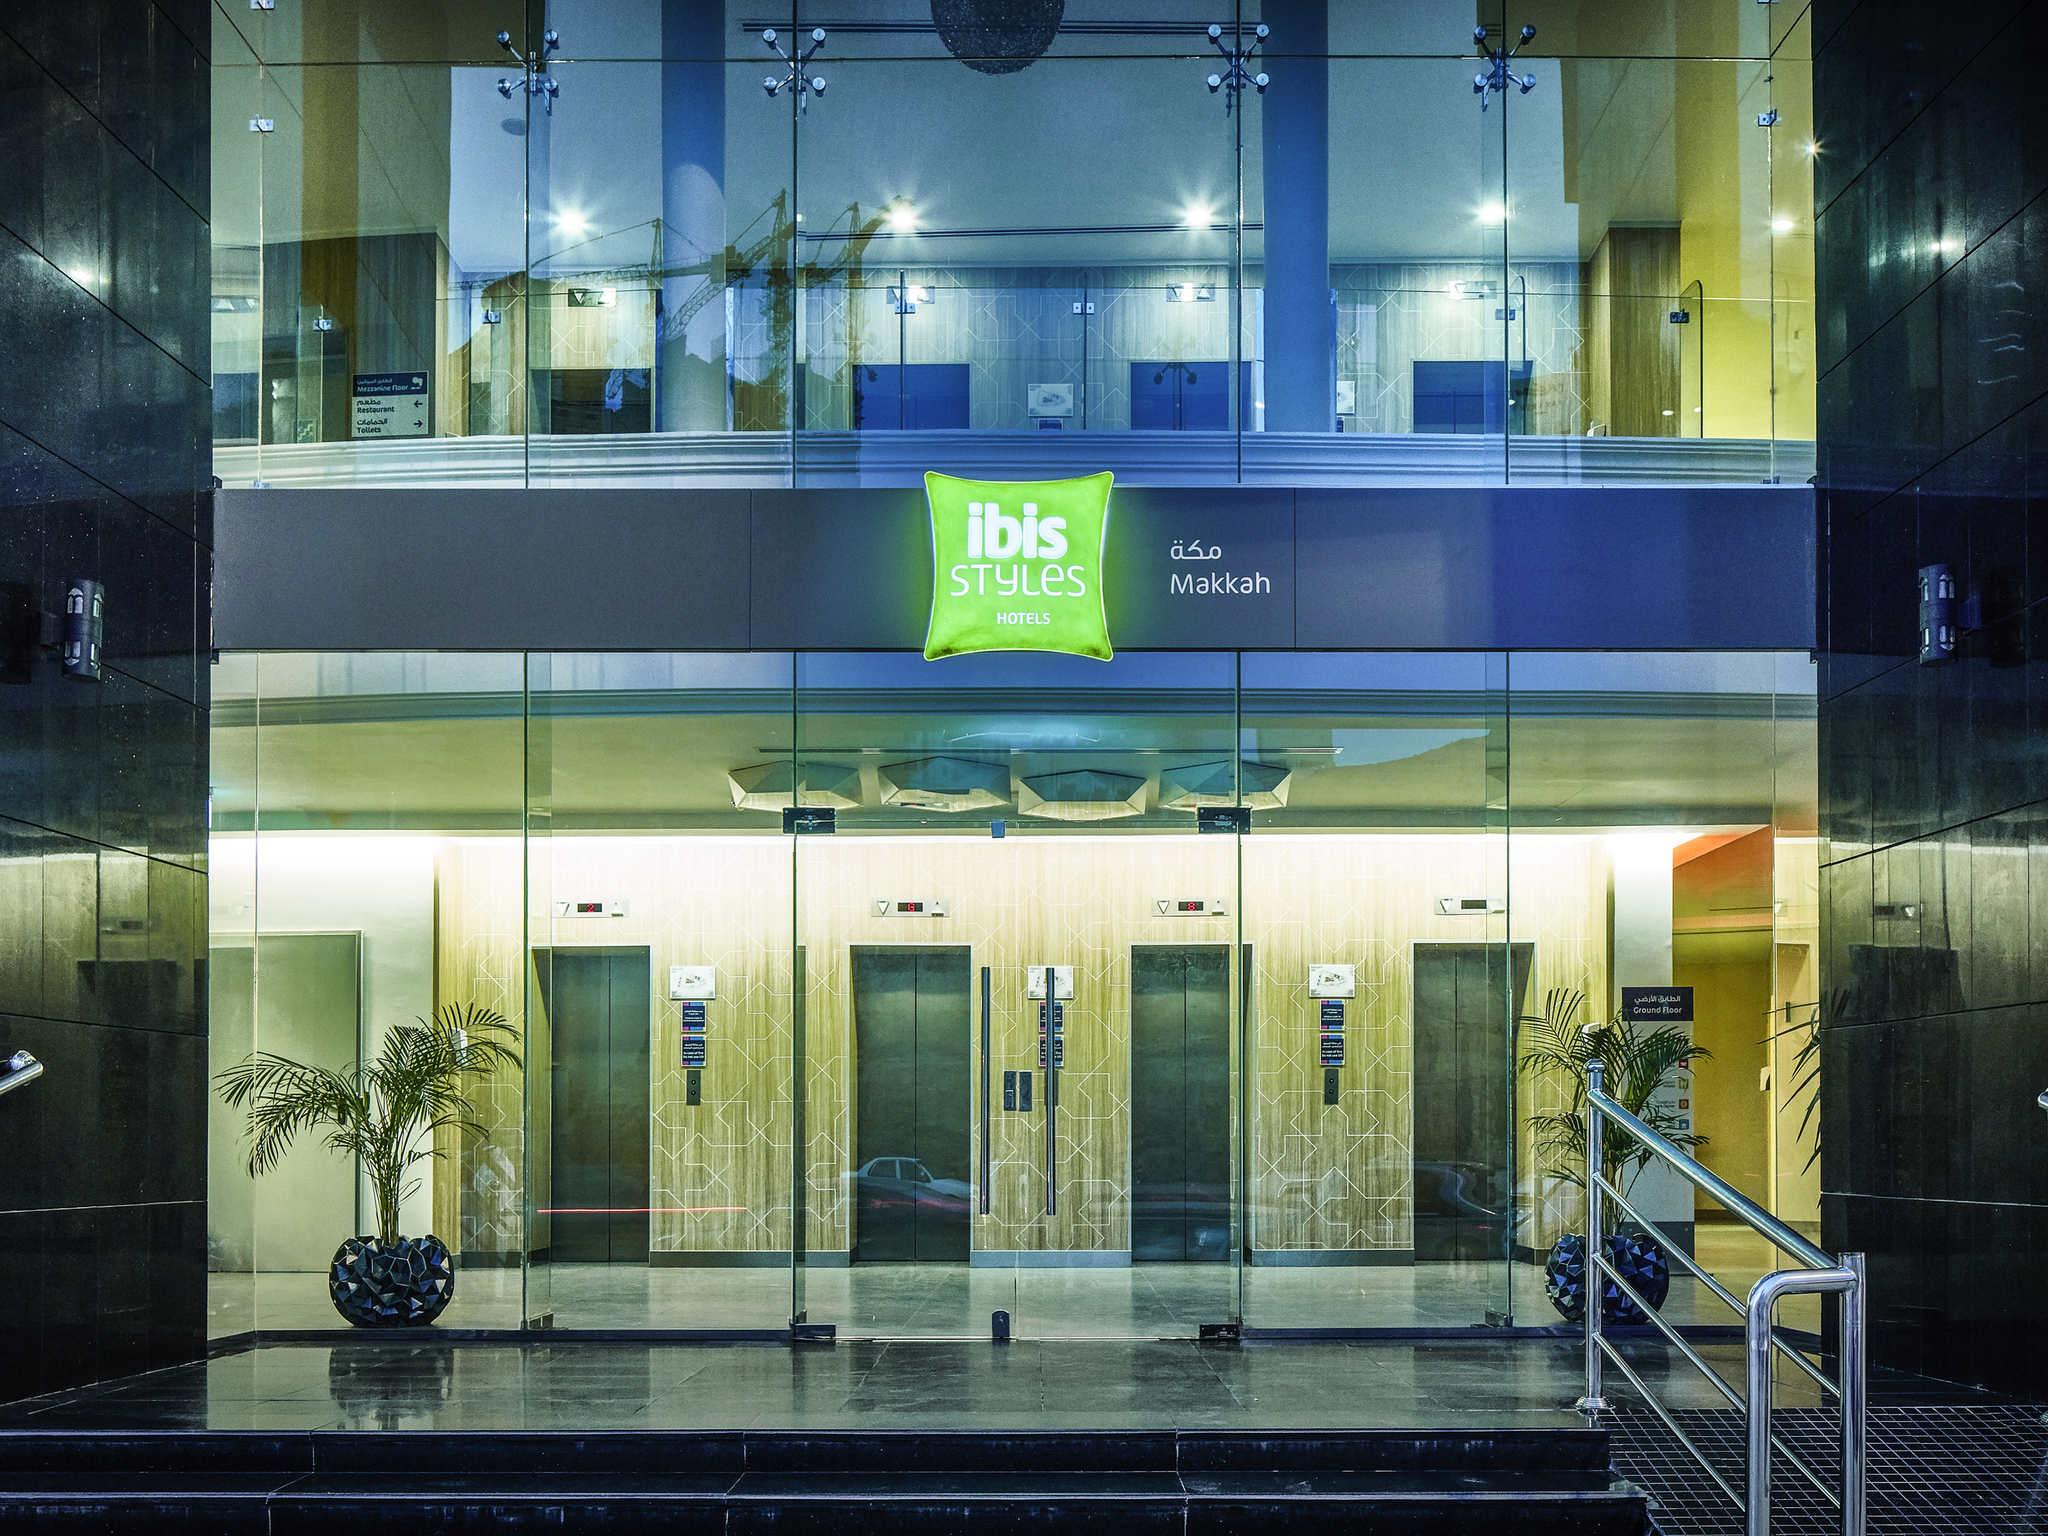 Hotel - ibis Styles Makkah